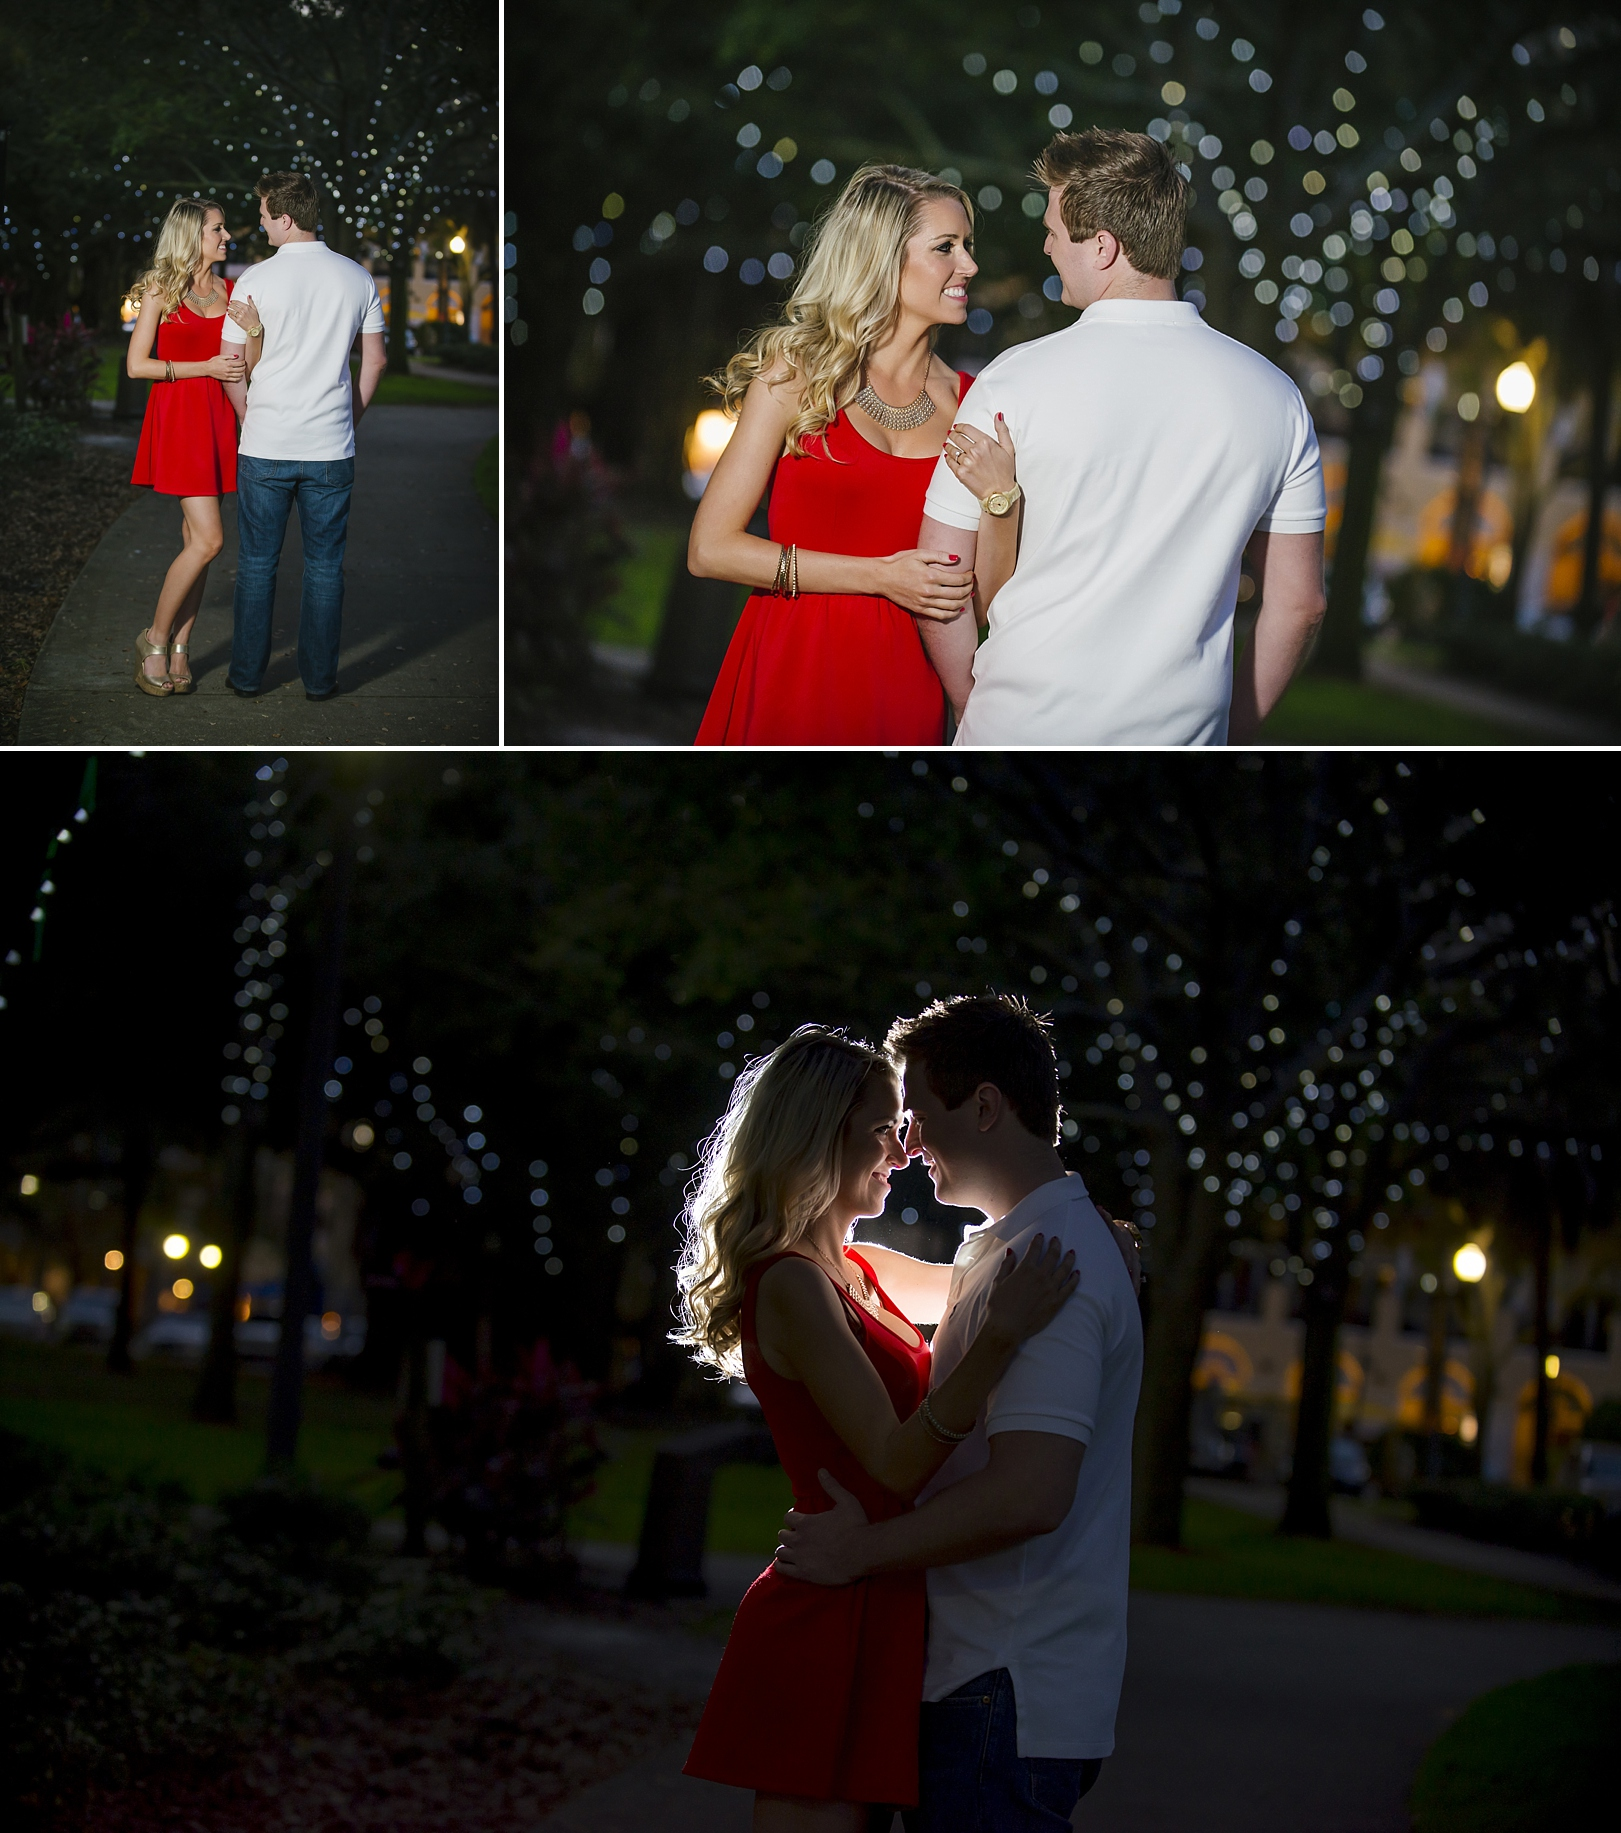 downtown st. pete engagement photos